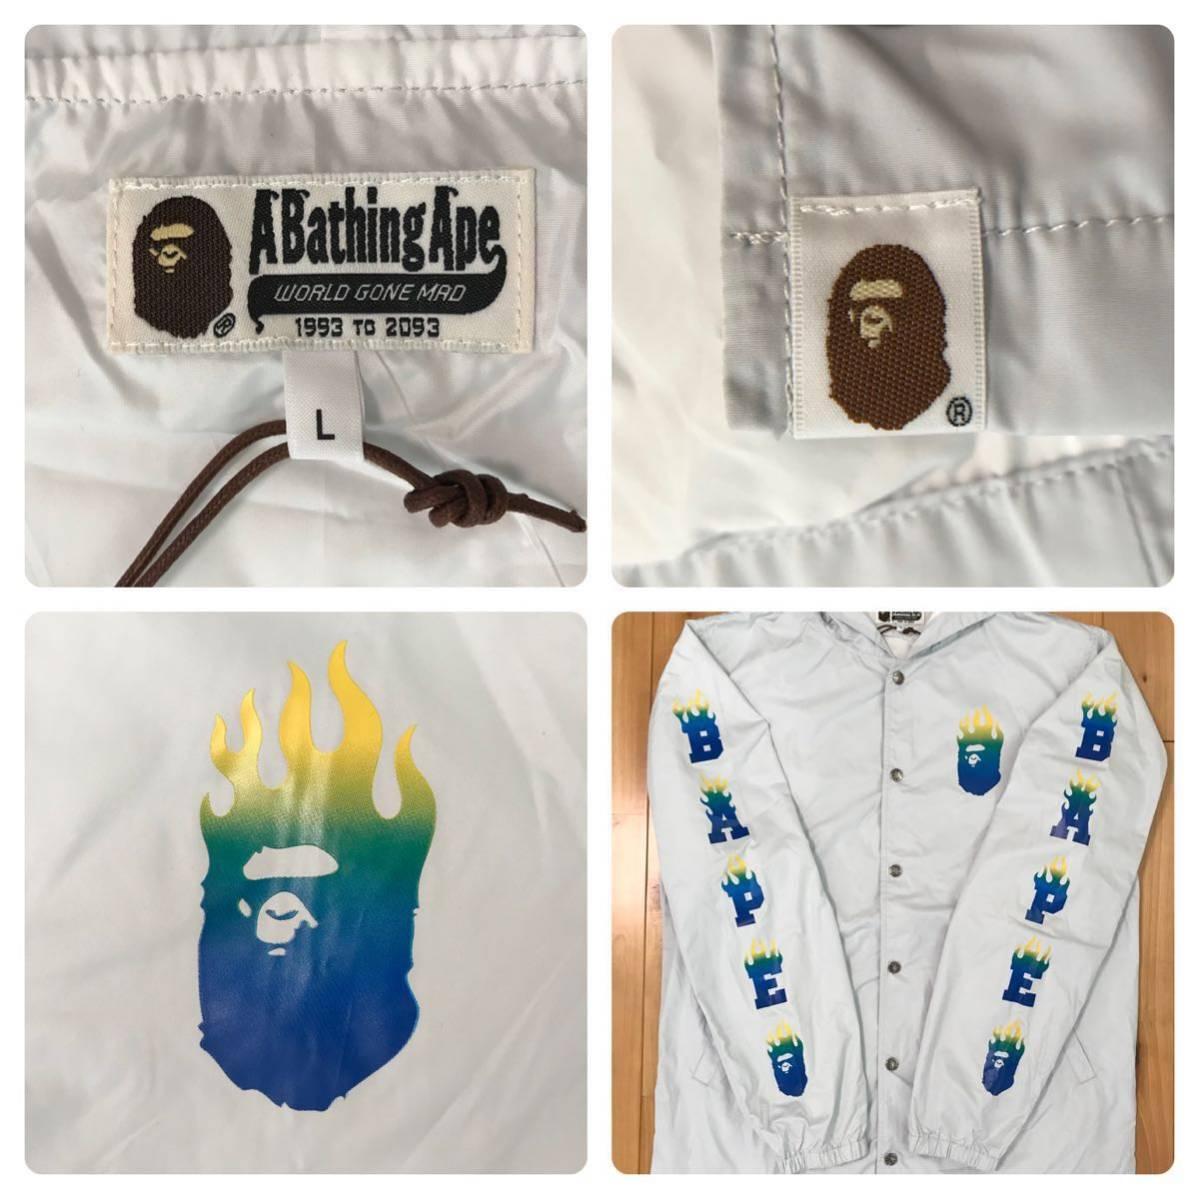 BAPE FLAME コーチジャケット Lサイズ gray a bathing ape hoodie fire jacket エイプ ベイプ アベイシングエイプ パーカー ジャケット